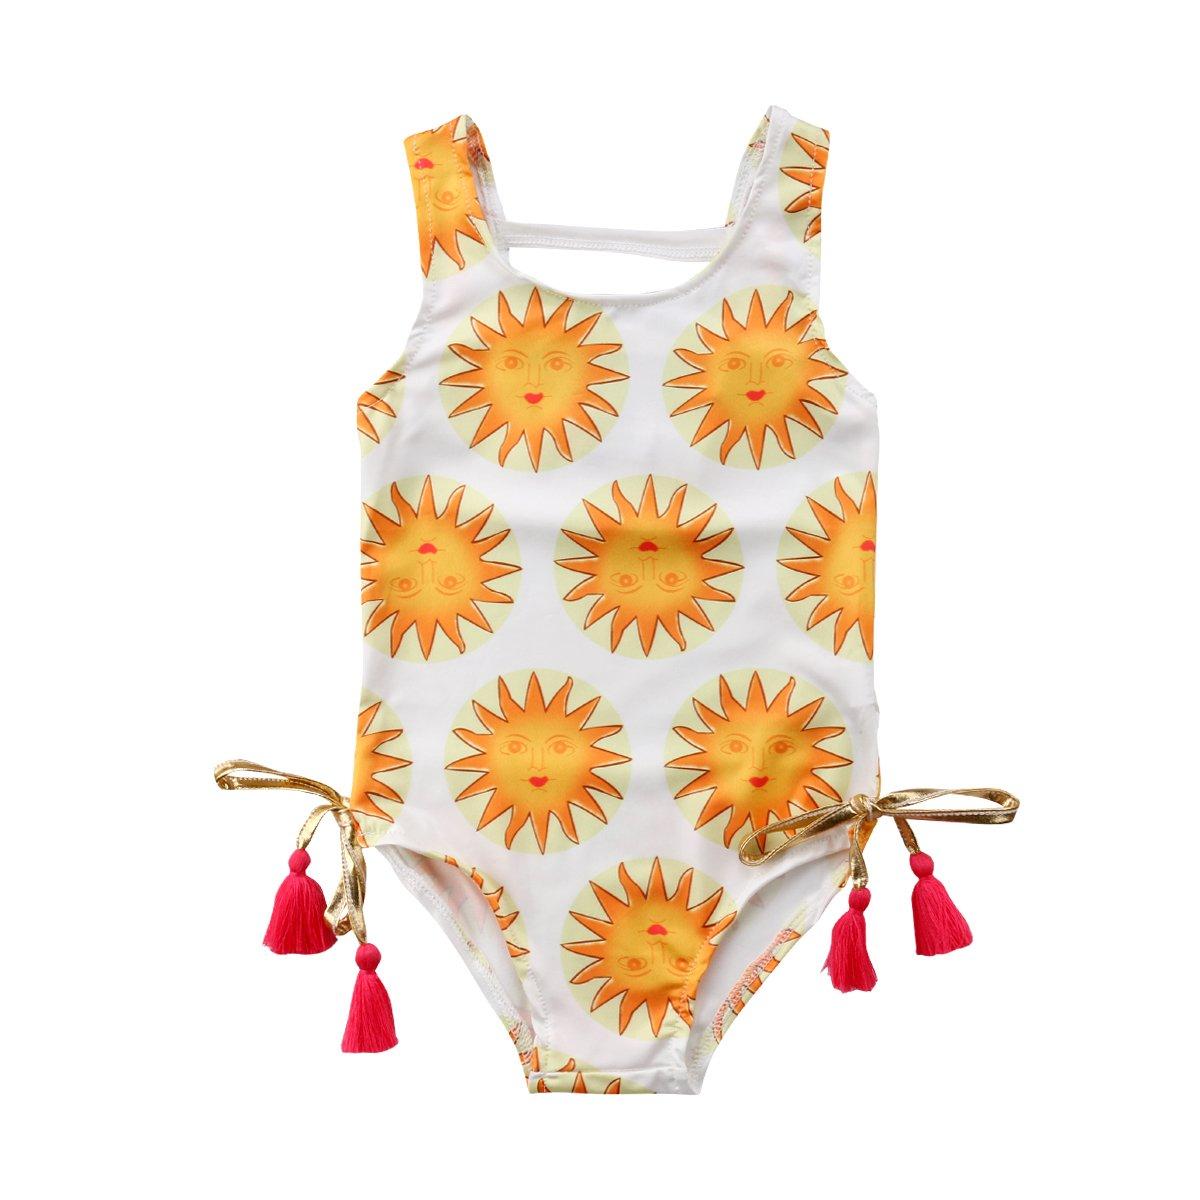 yannzi Toddler Baby Girls Swimsuit Sun Tassel One-Piece Swimwear Bathing Suit for Beach